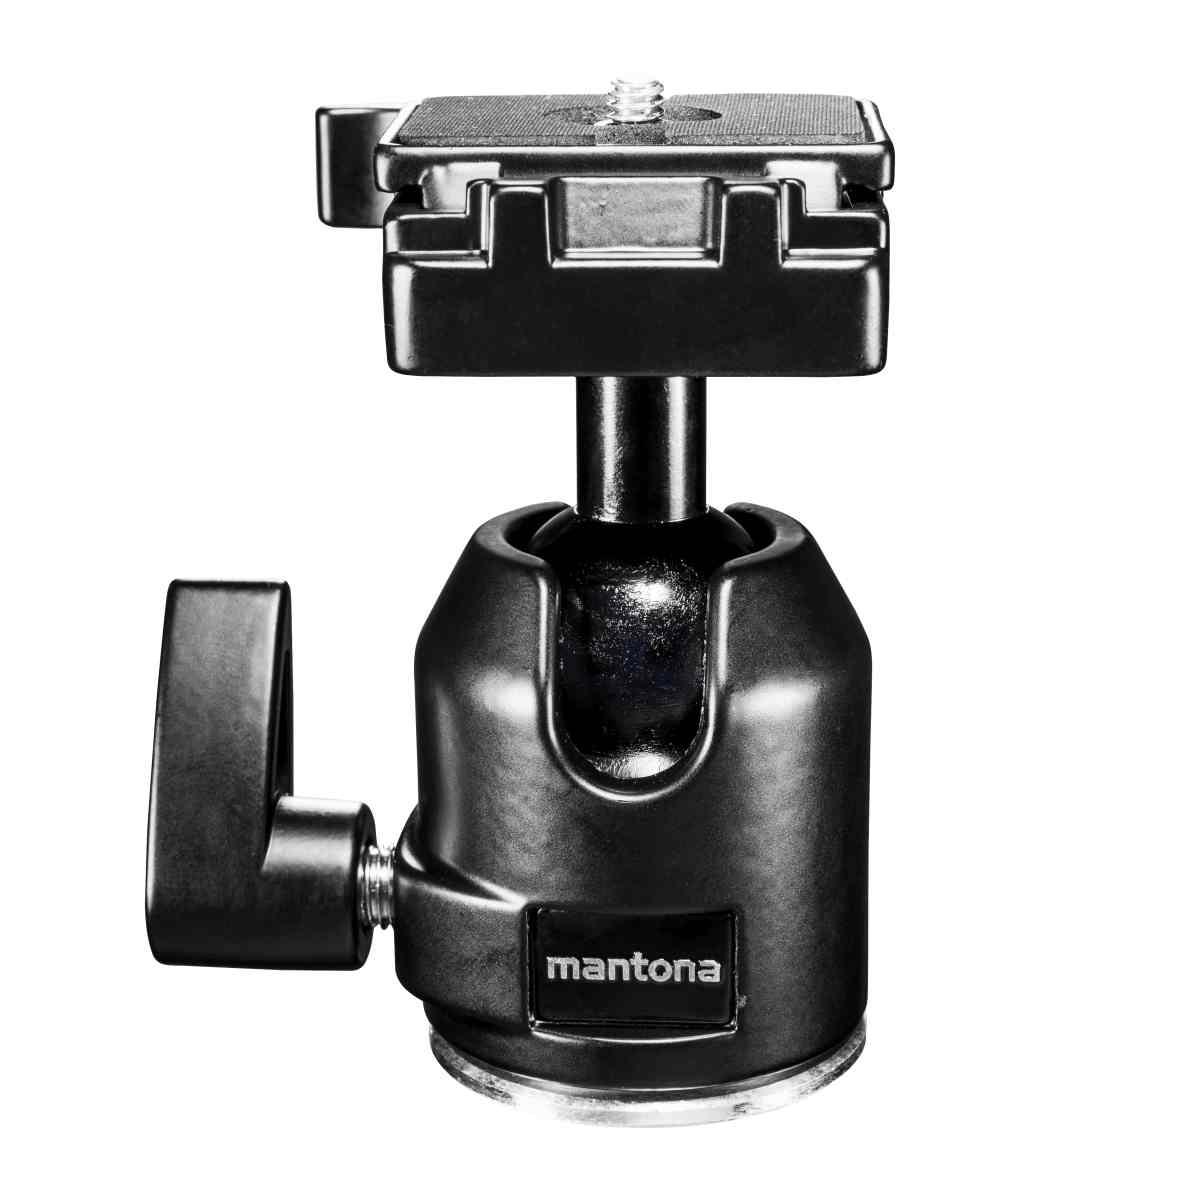 Mantona ballhead XL for Scout tripod